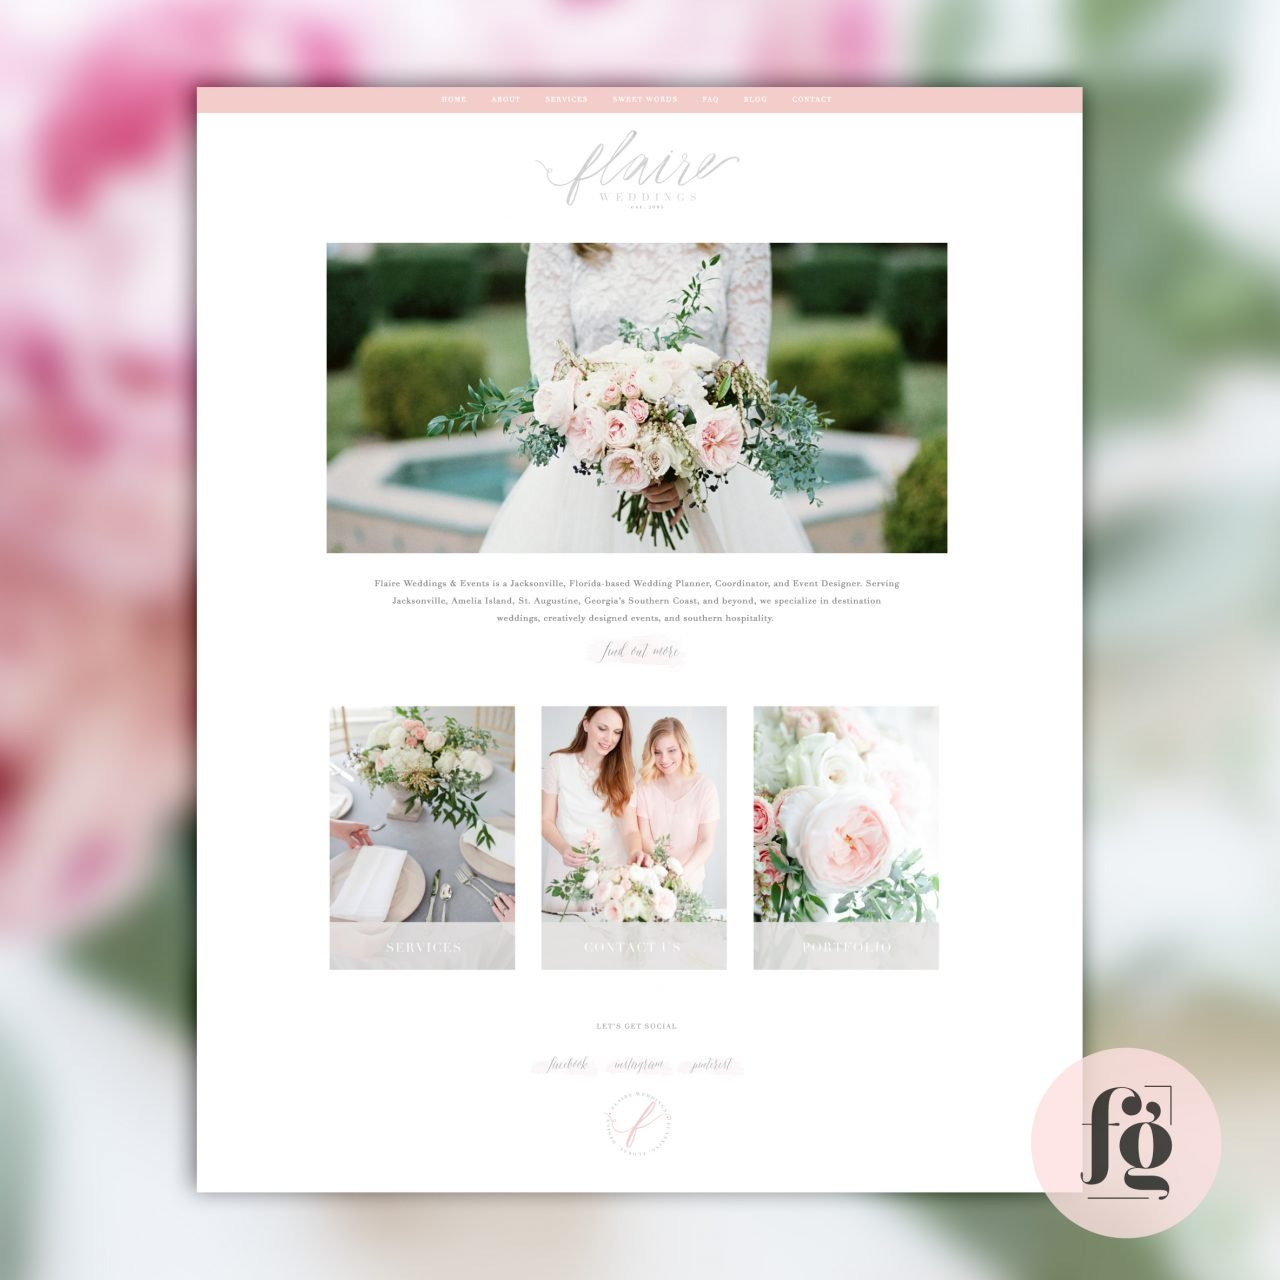 Flaire Weddings Website Homepage